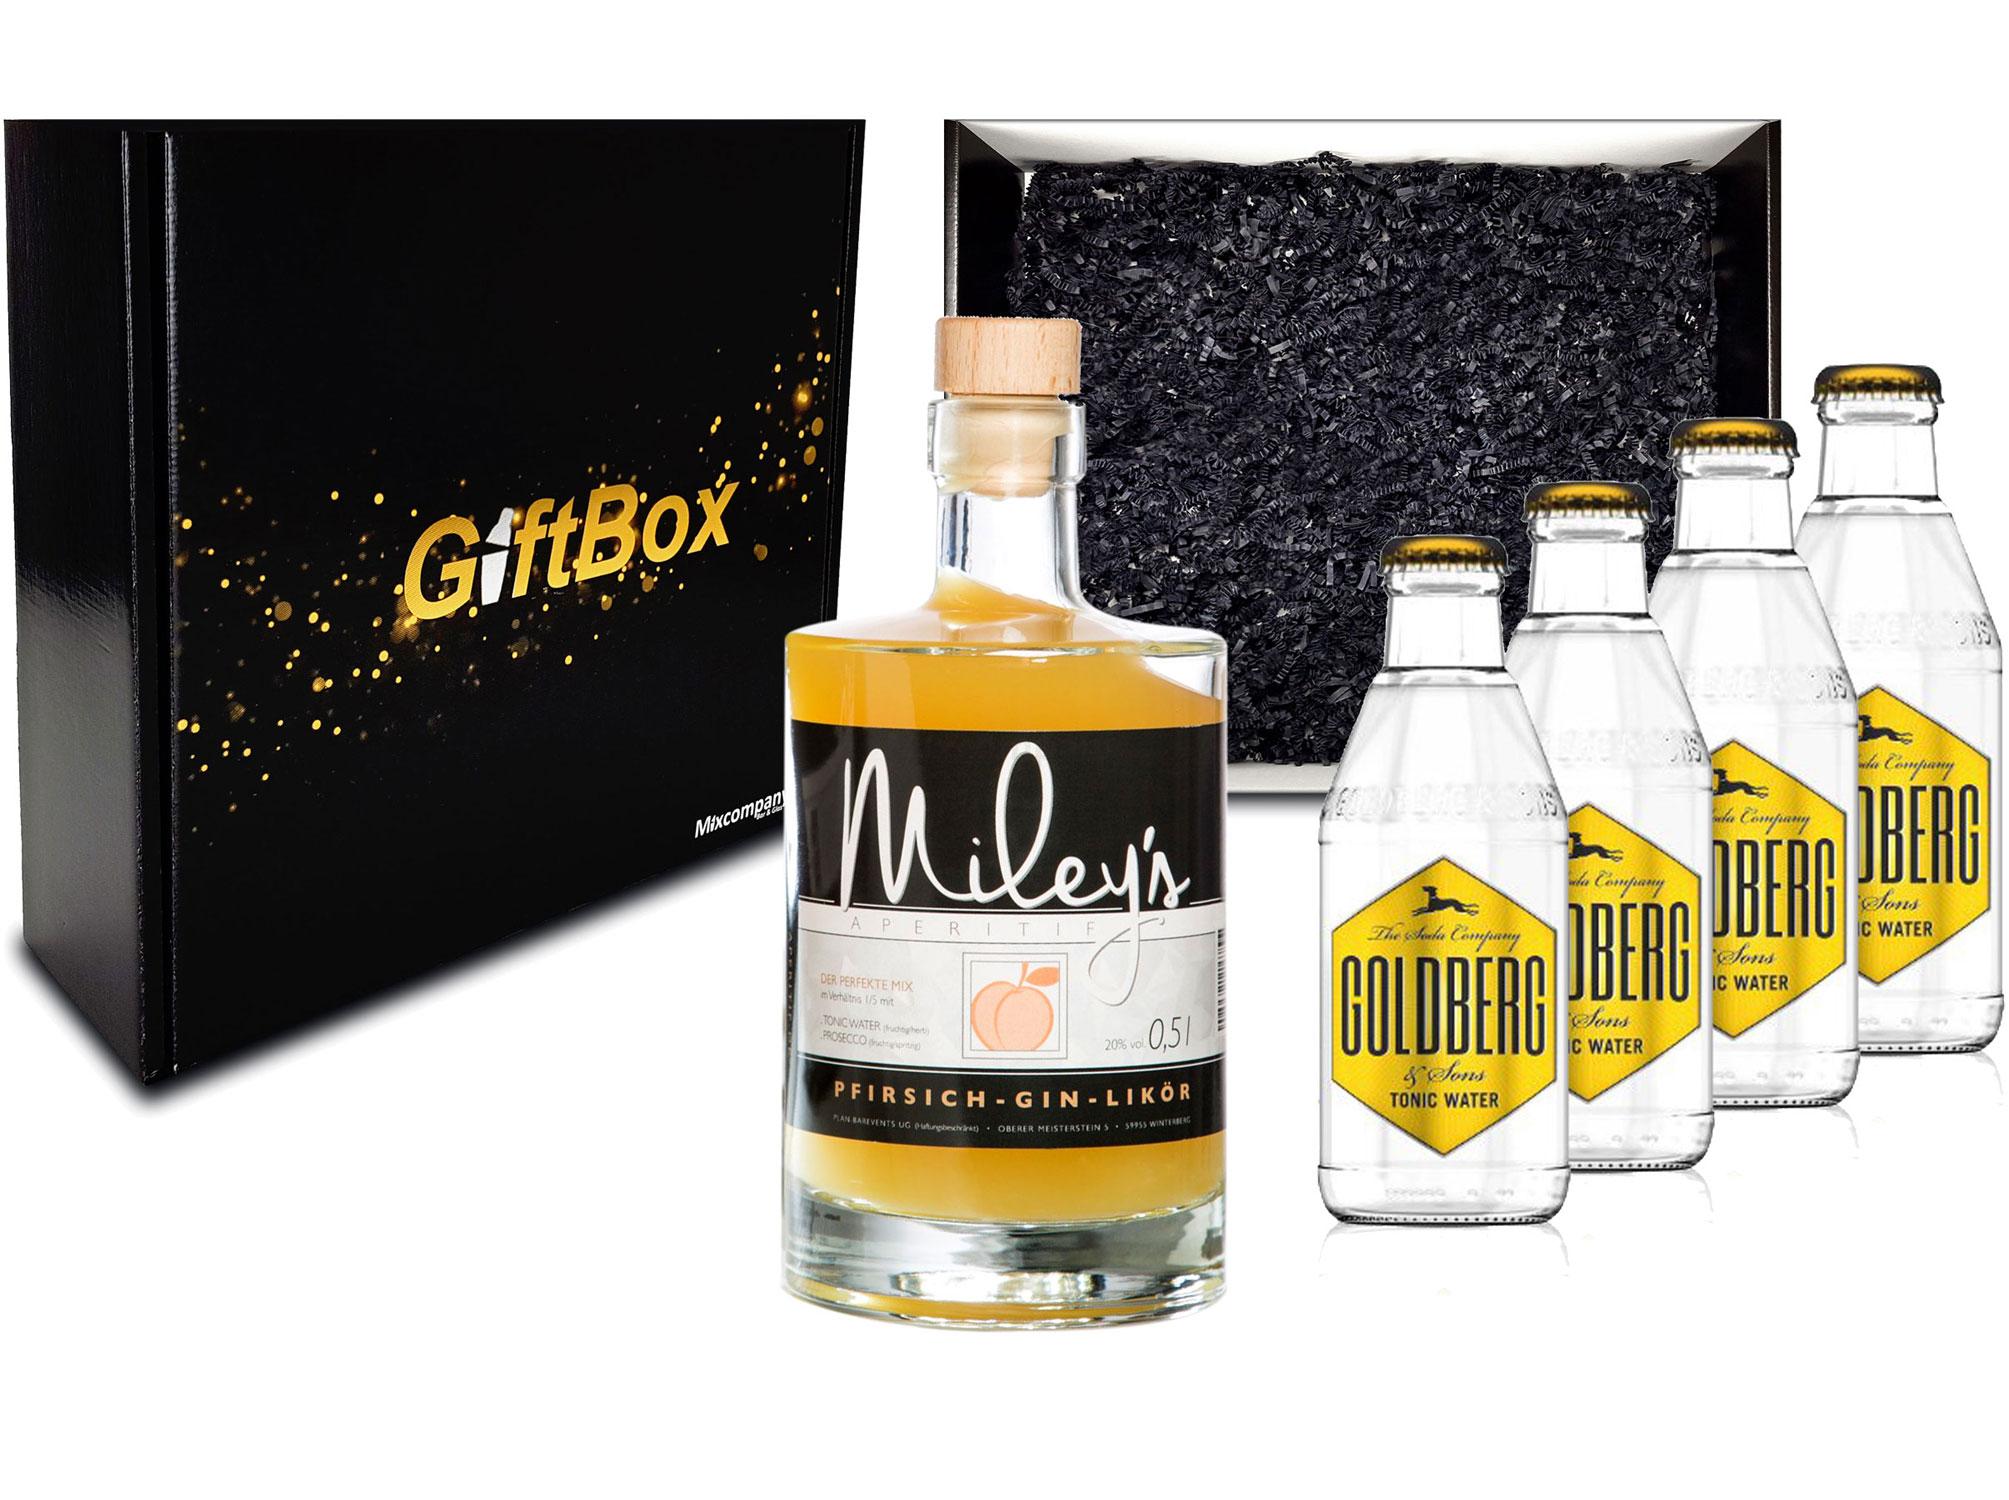 Gin Tonic Giftbox Geschenkset - Mileys Pfirsich Gin Likör 0,5l (20% Vol) + 4x Goldberg Tonic Water 200ml inkl. Pfand MEHRWEG - [Enthält Sulfite]